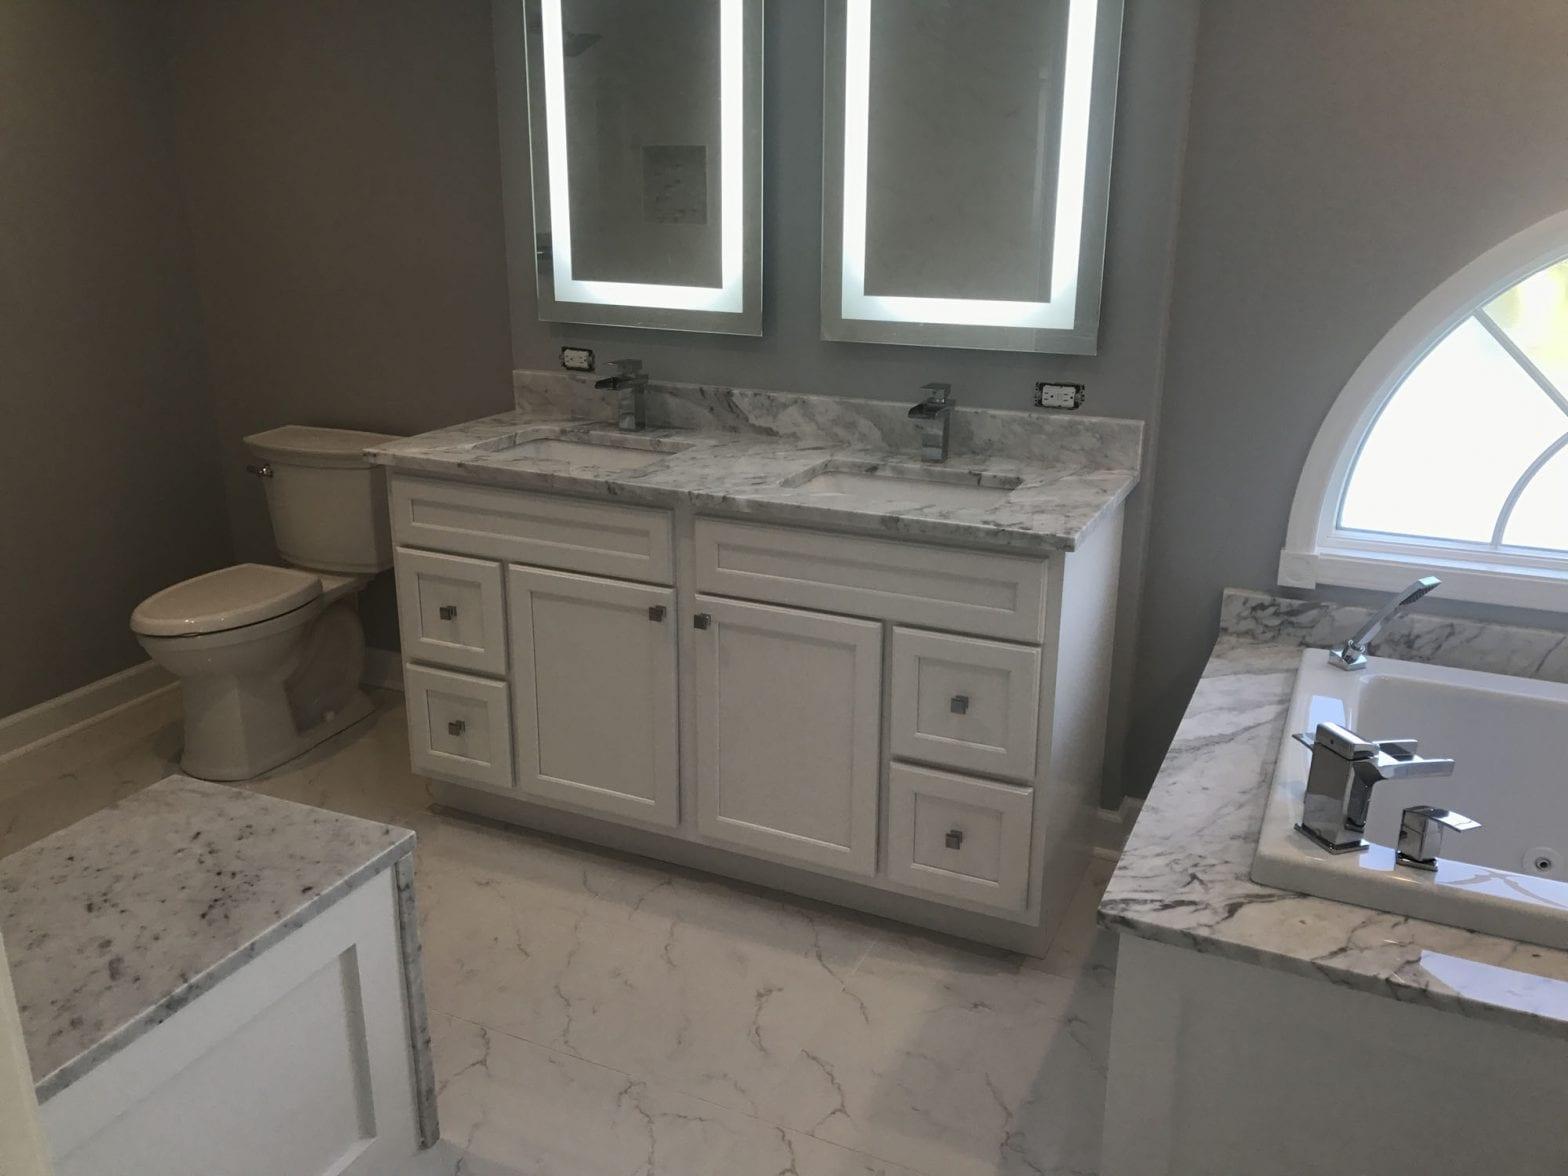 Bathroom Remodeling In Hoffman Estates - granite countertops and tub